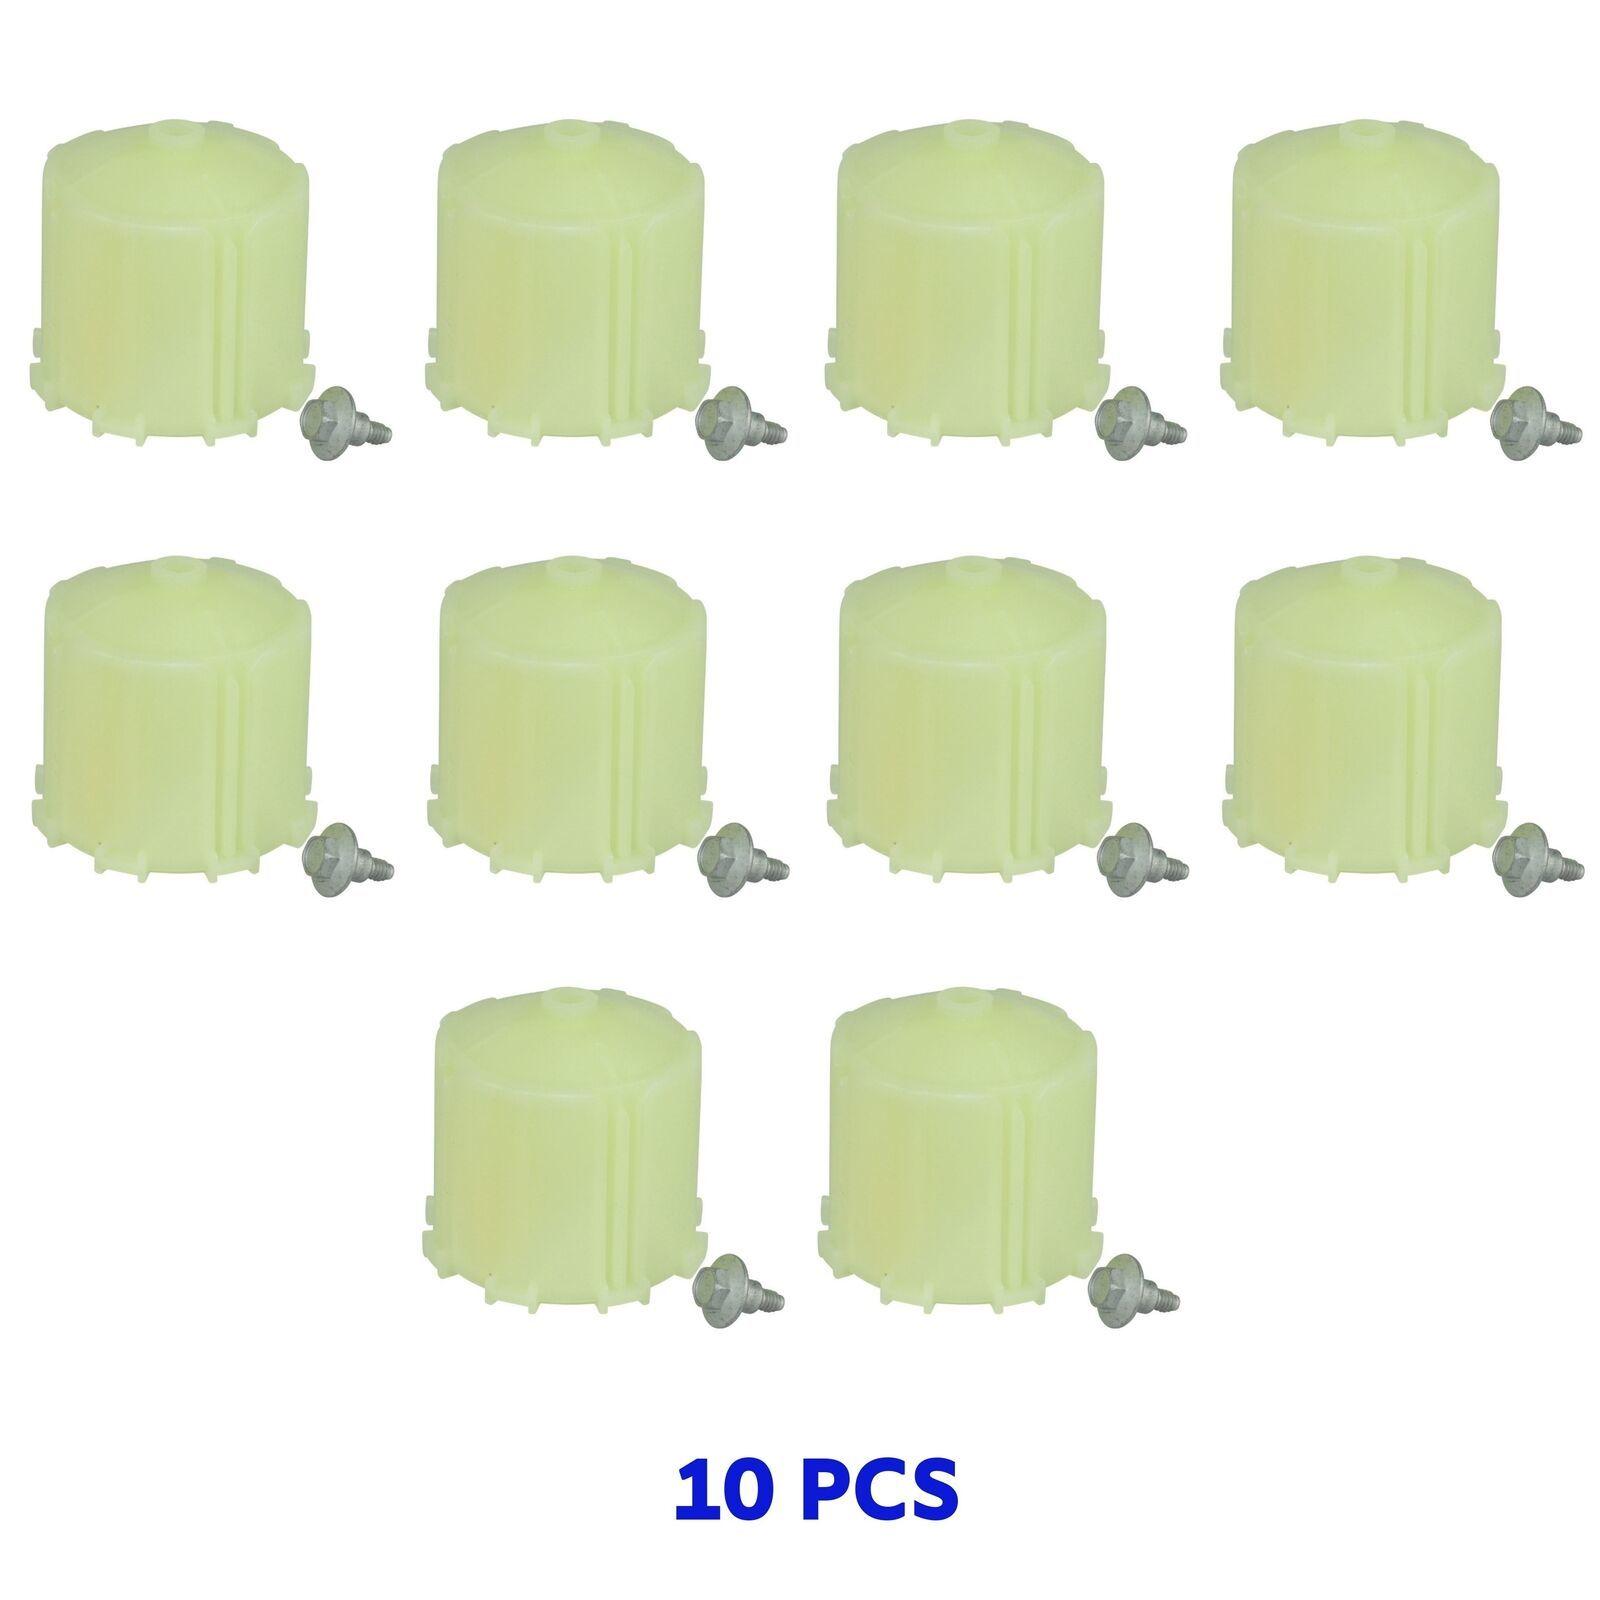 4x WH49X10042 fits GE Agitator Plastic Coupling Coupler AP3964635 PS1517844